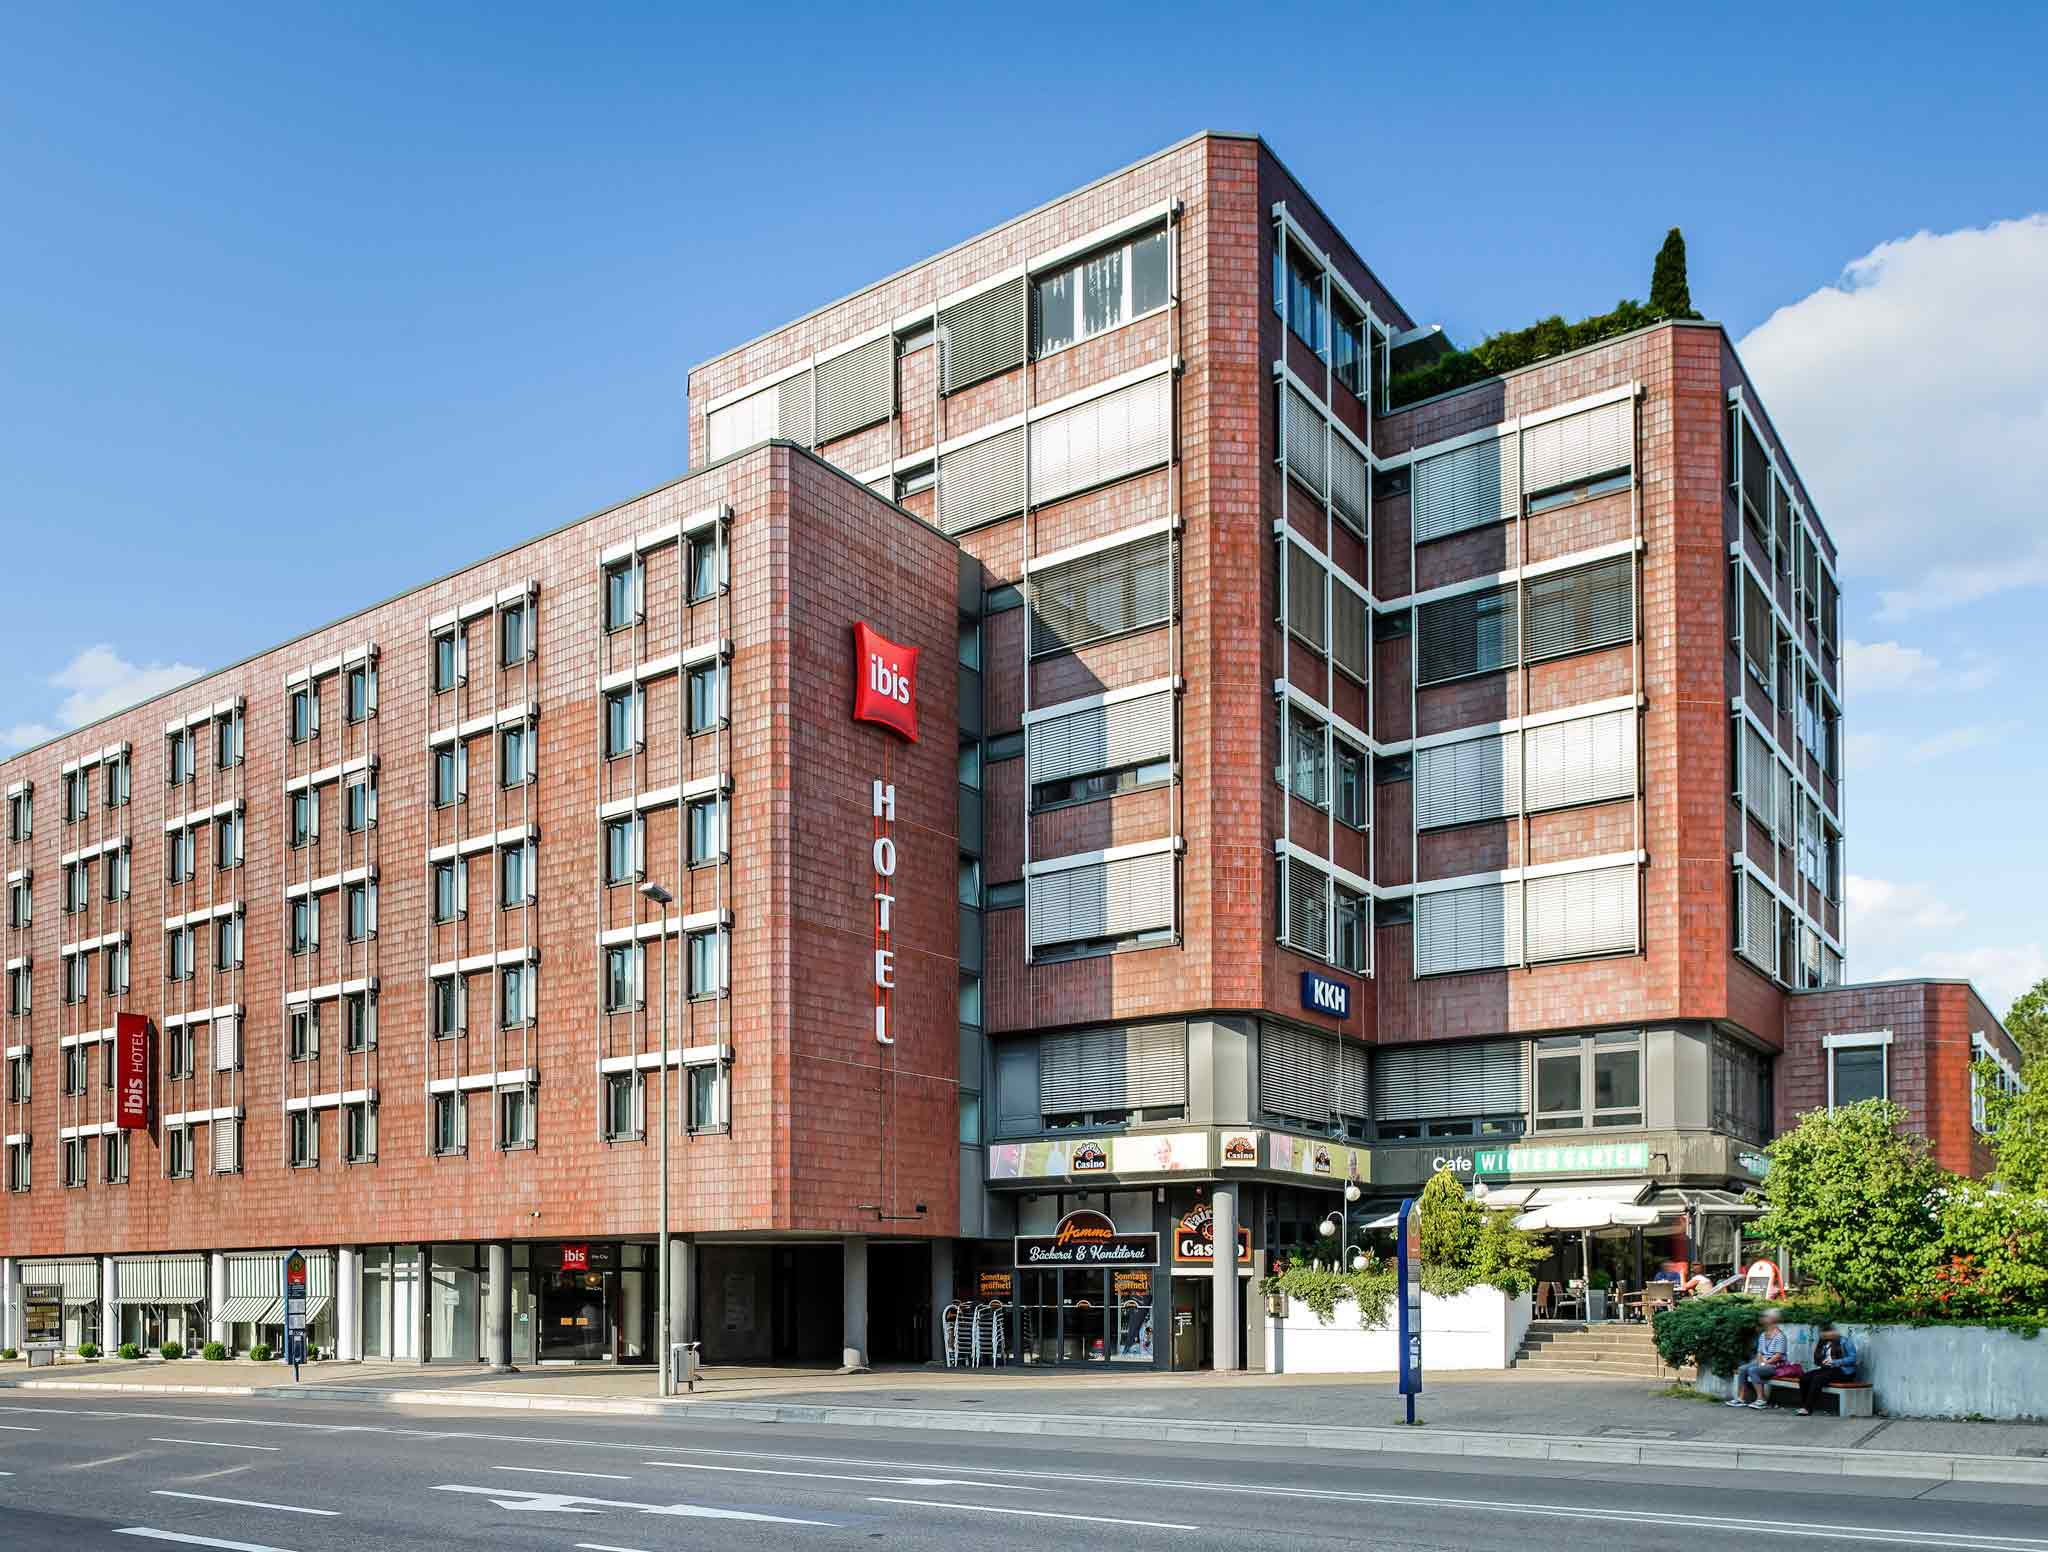 Hotell – ibis Ulm City